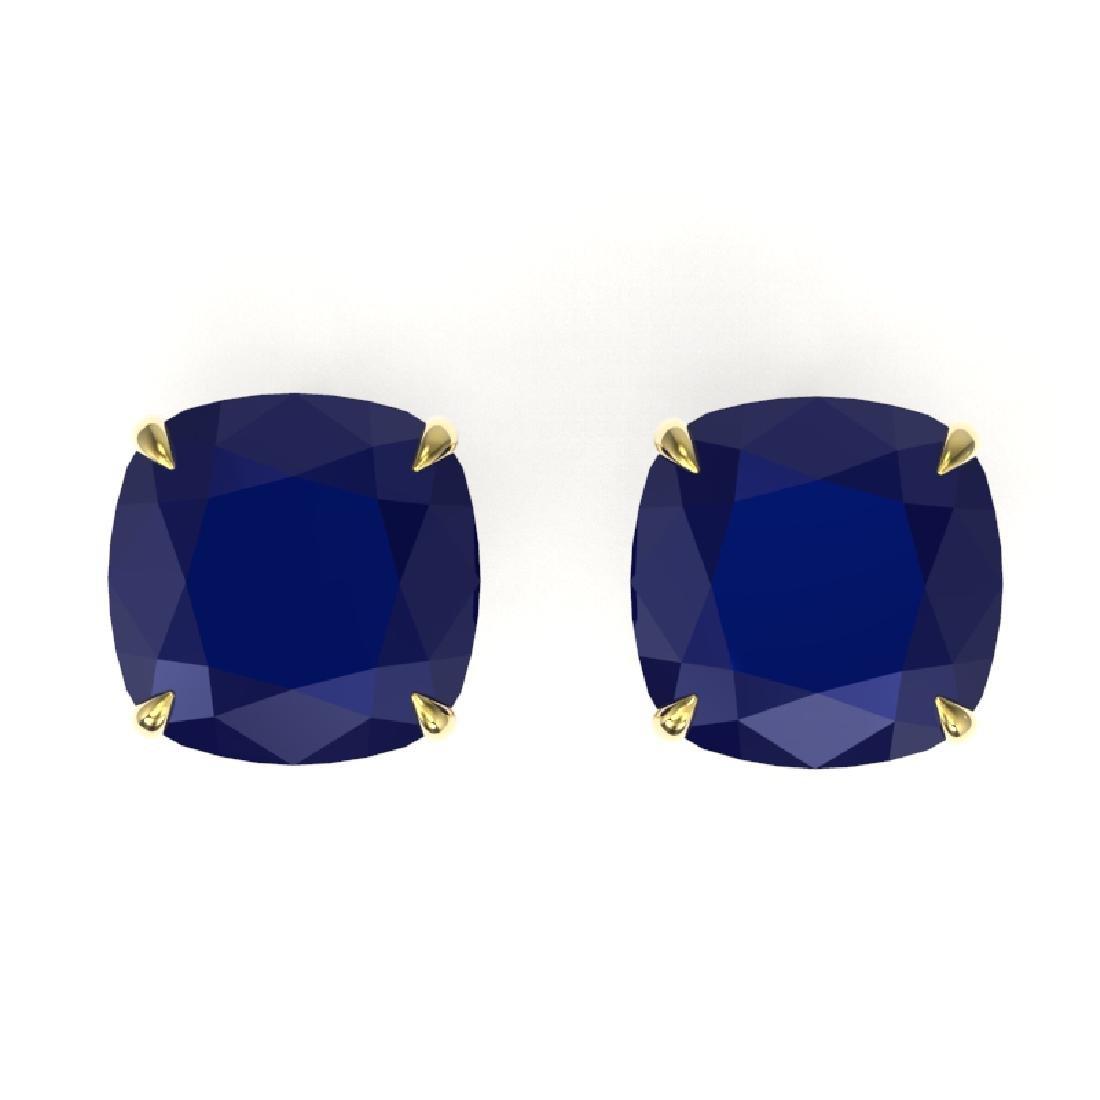 12 CTW Cushion Cut Sapphire Designer Solitaire Stud